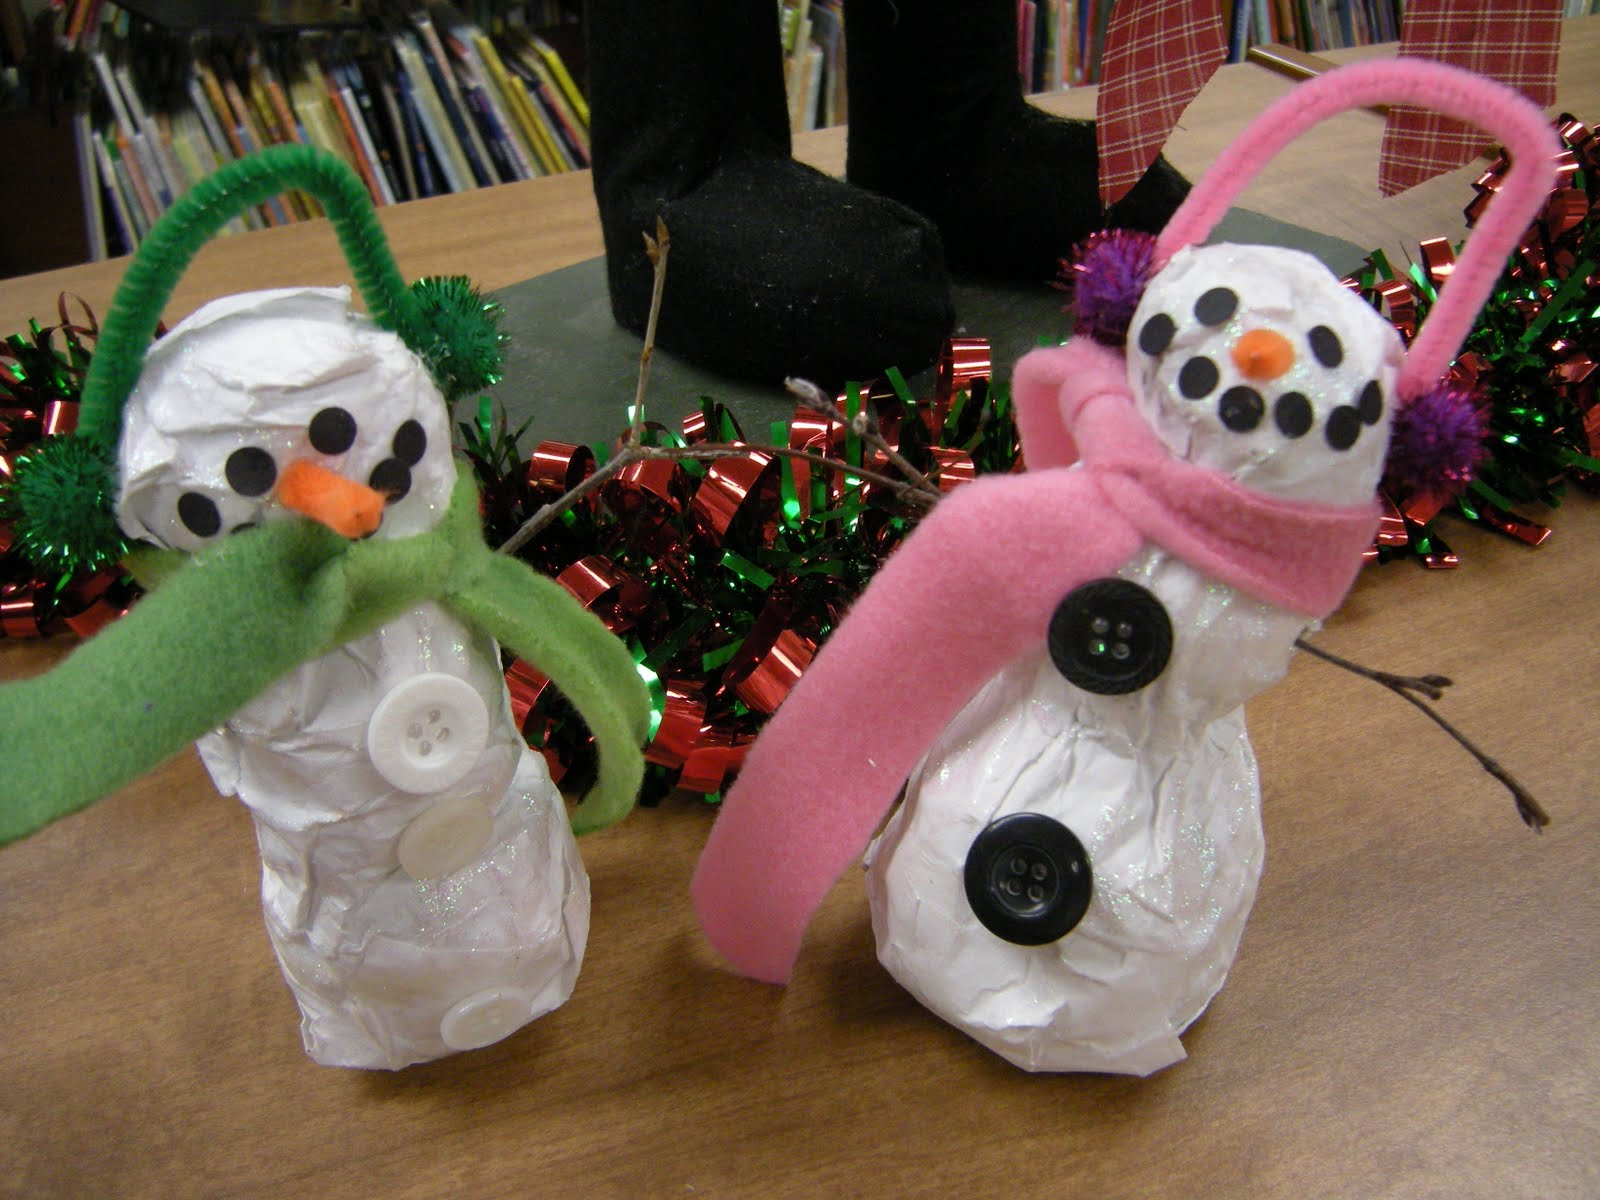 artolazzi papier mache snowmen. Black Bedroom Furniture Sets. Home Design Ideas